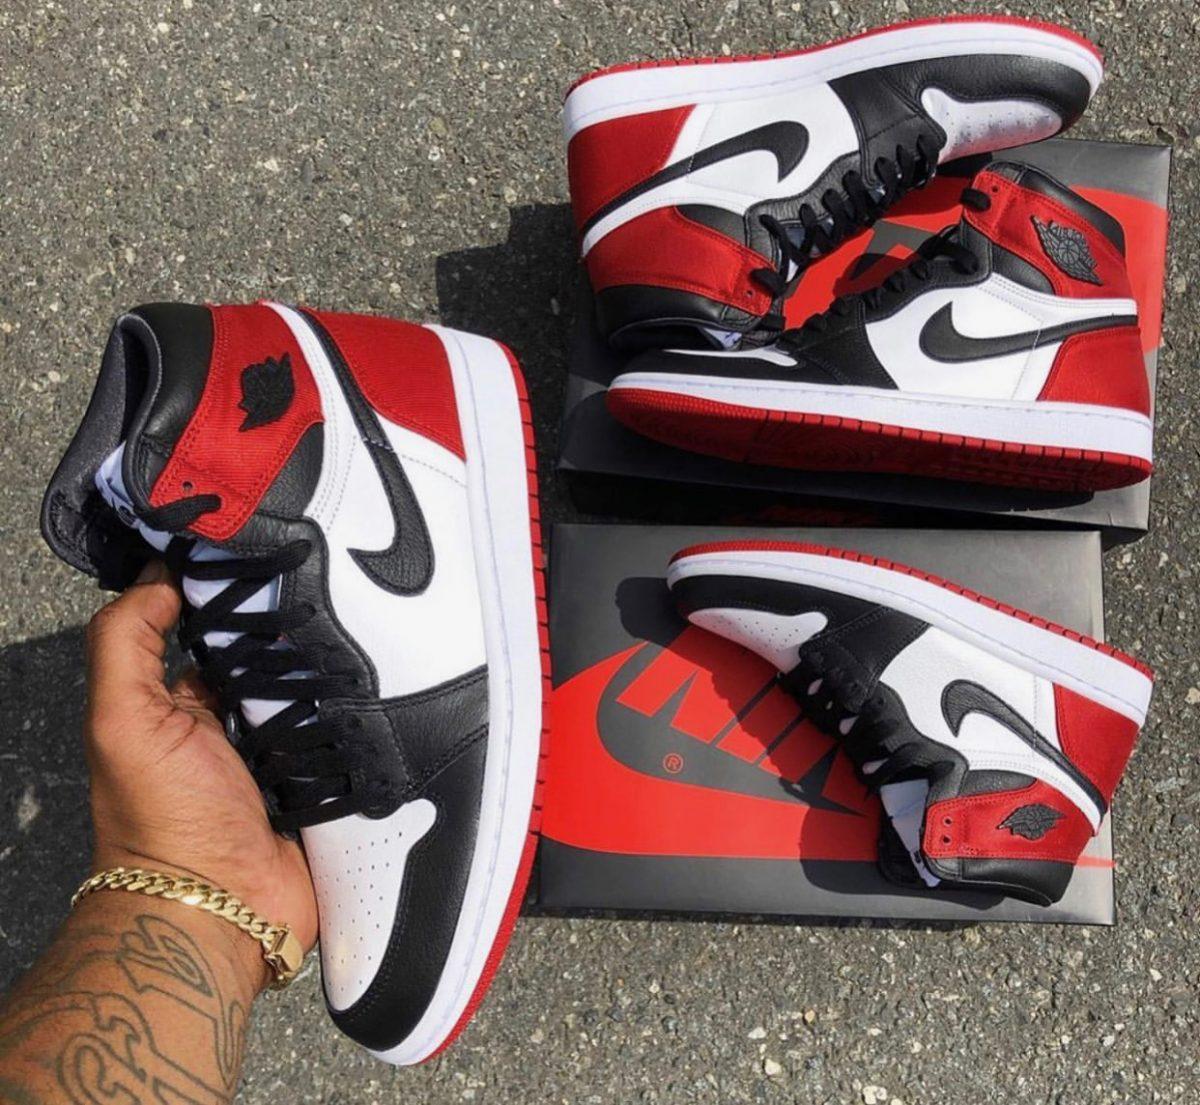 Air Jordan 1 Satin Black Toe Arrives August 17th